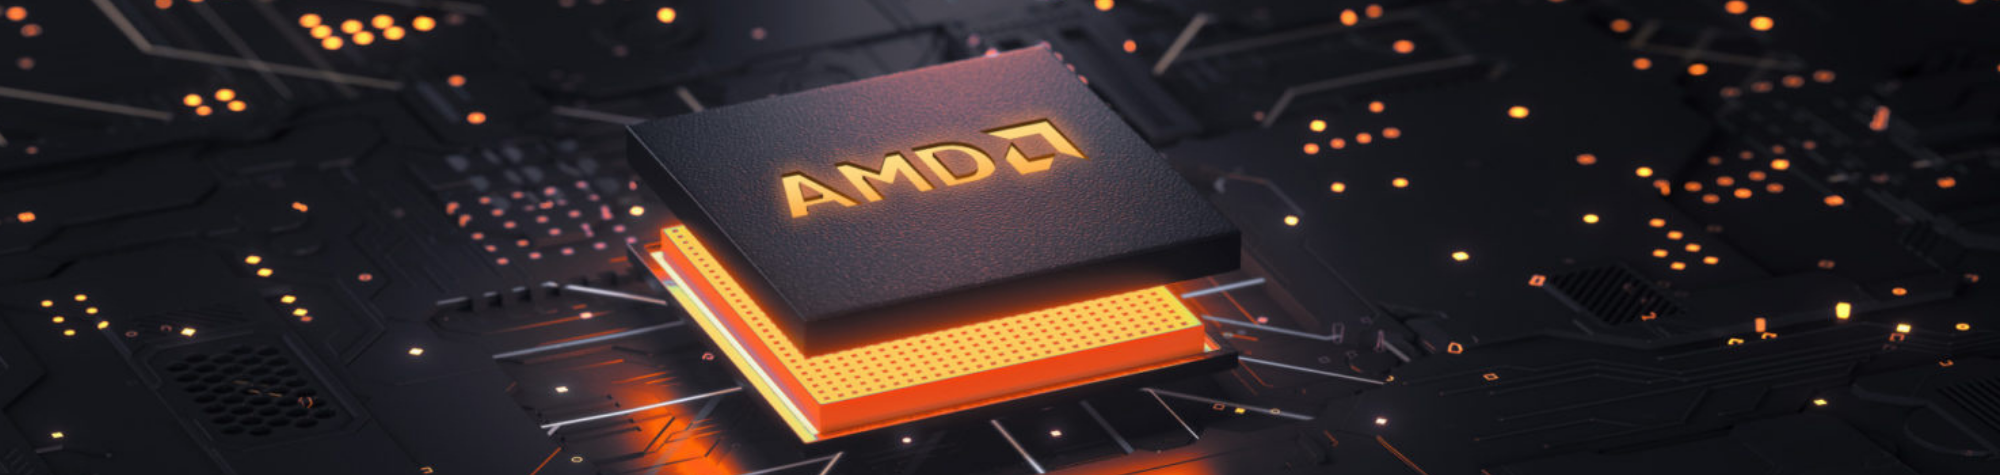 AMD Ryzen 5000 Processors Announced!